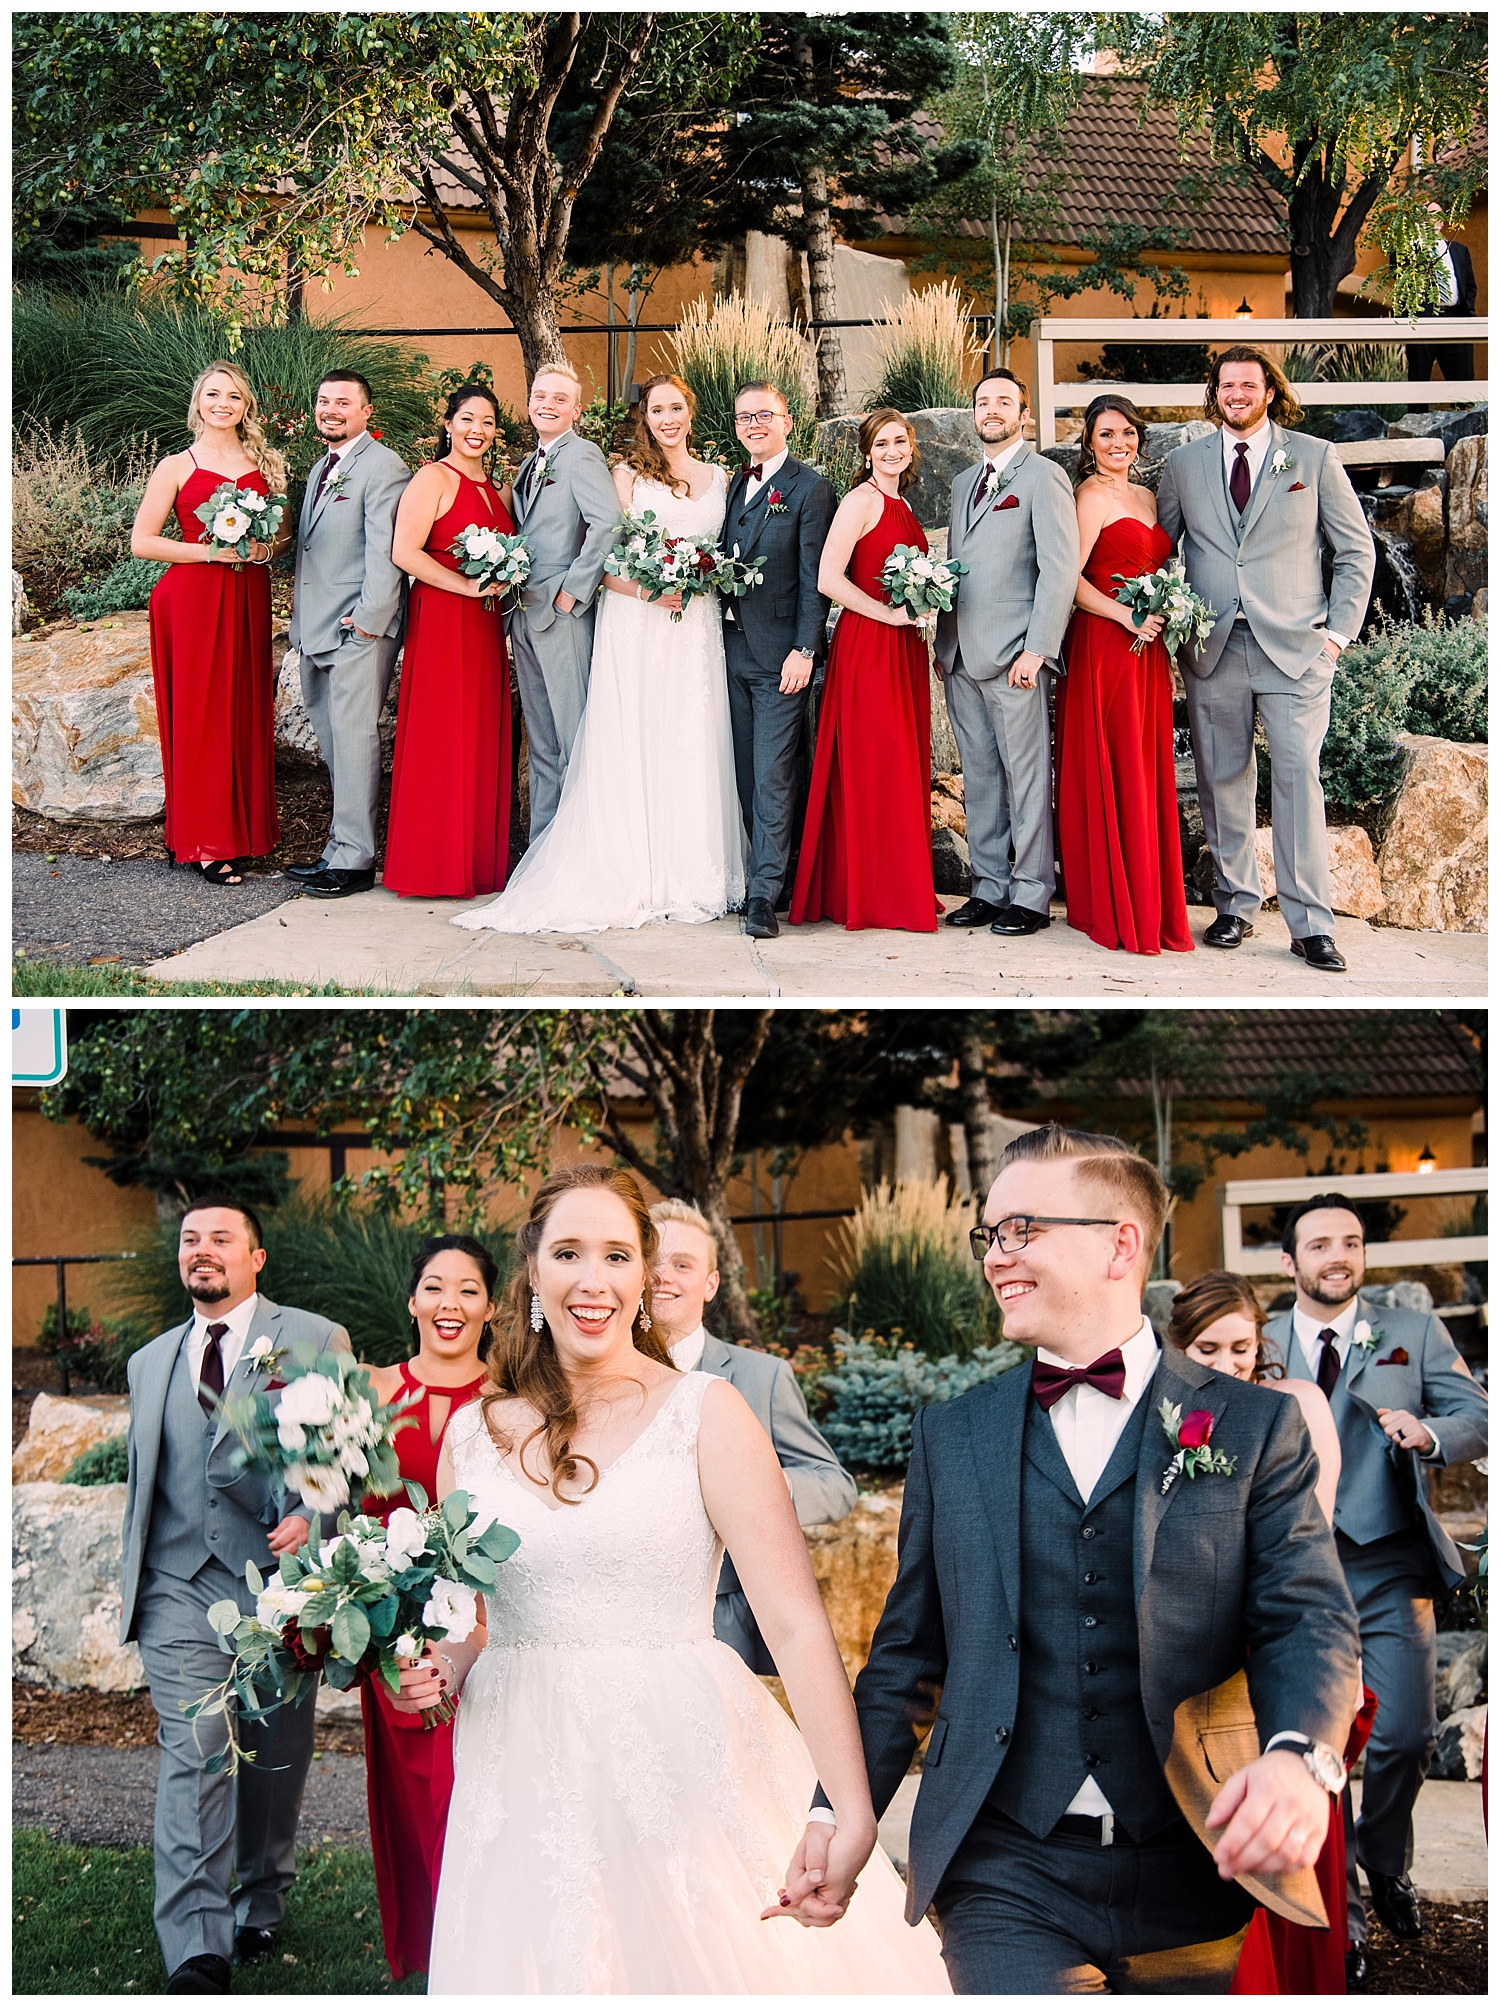 Danish_Wedding_Traditions_Denver_Colorado_Photographer_Wedgewood_Brittany_Hill_Apollo_Fields_022.jpg